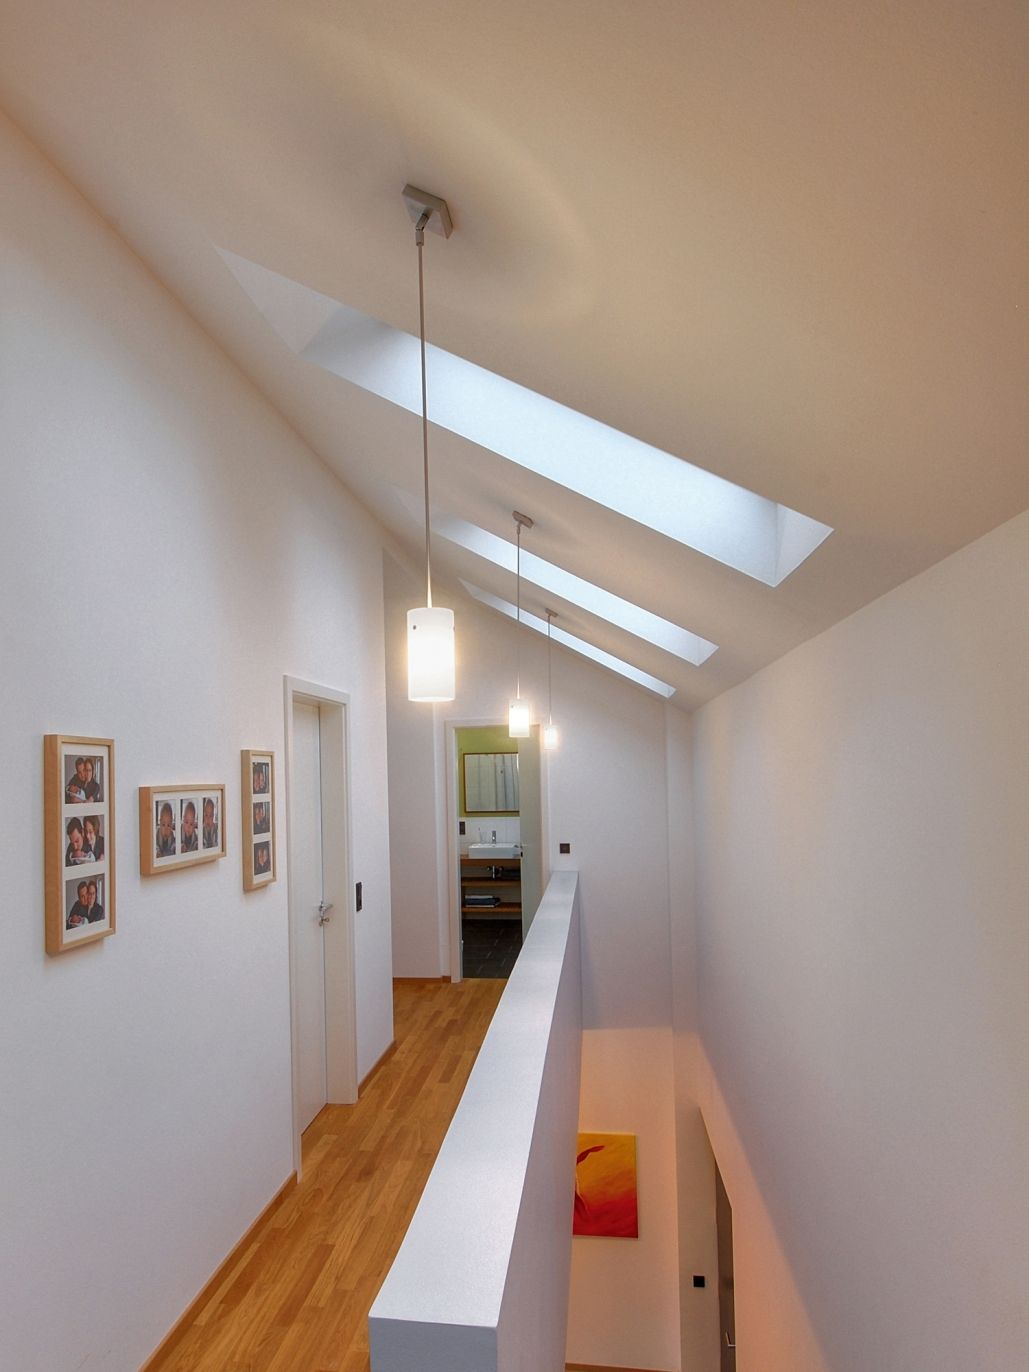 dachschräge lampe  Beleuchtung dachschräge, Dachschräge, Lampen